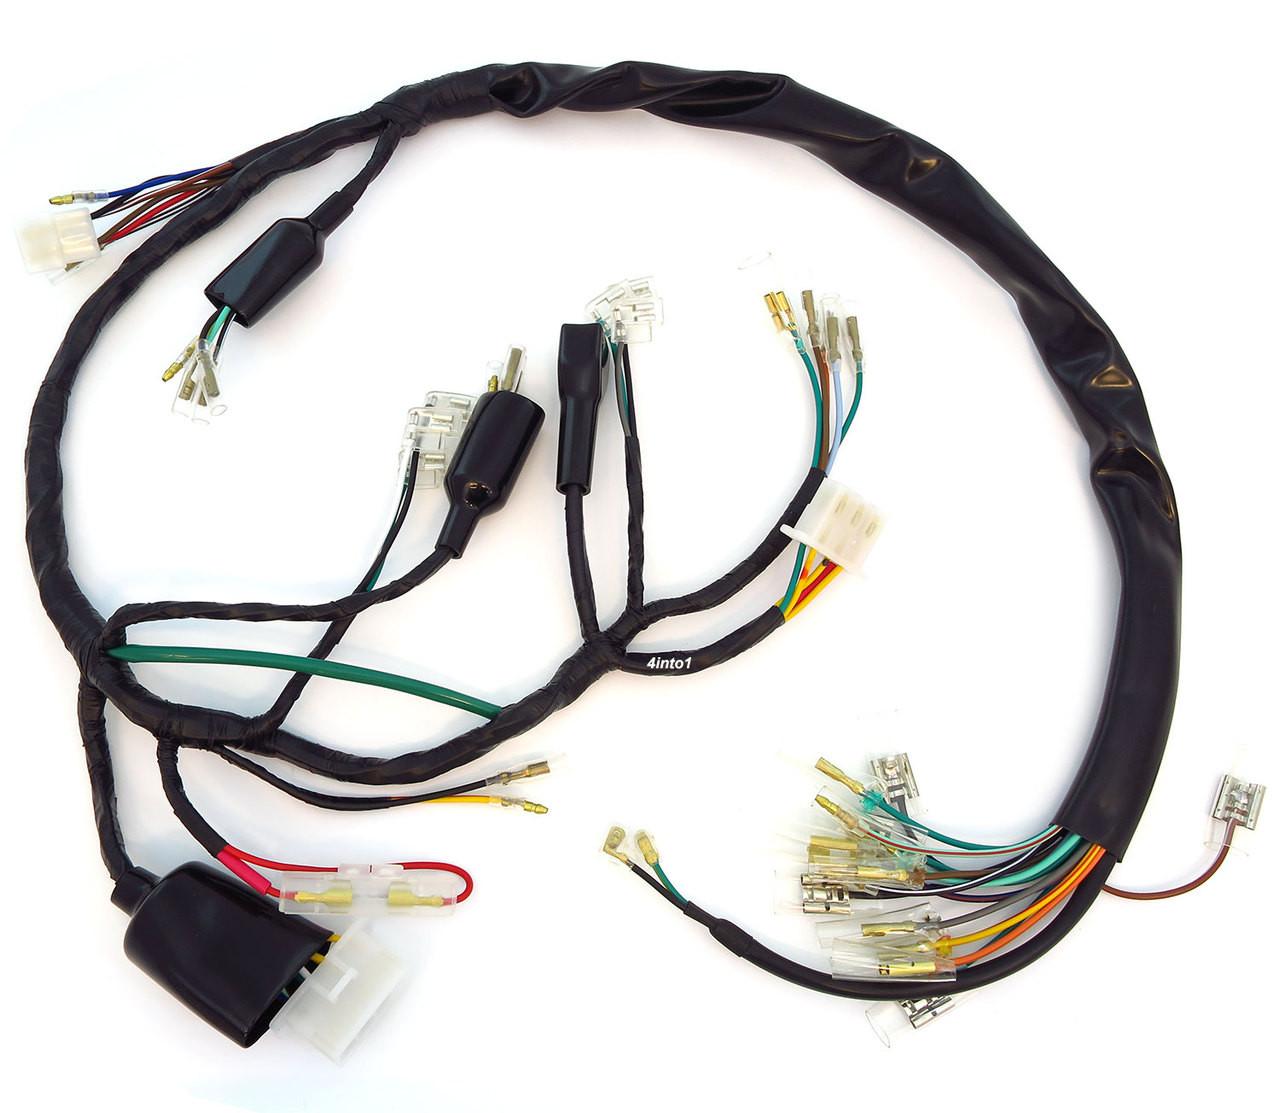 medium resolution of main wiring harness 32100 333 000 honda cb350f make your own honda cb350 wiring harness honda cb350 wiring harness